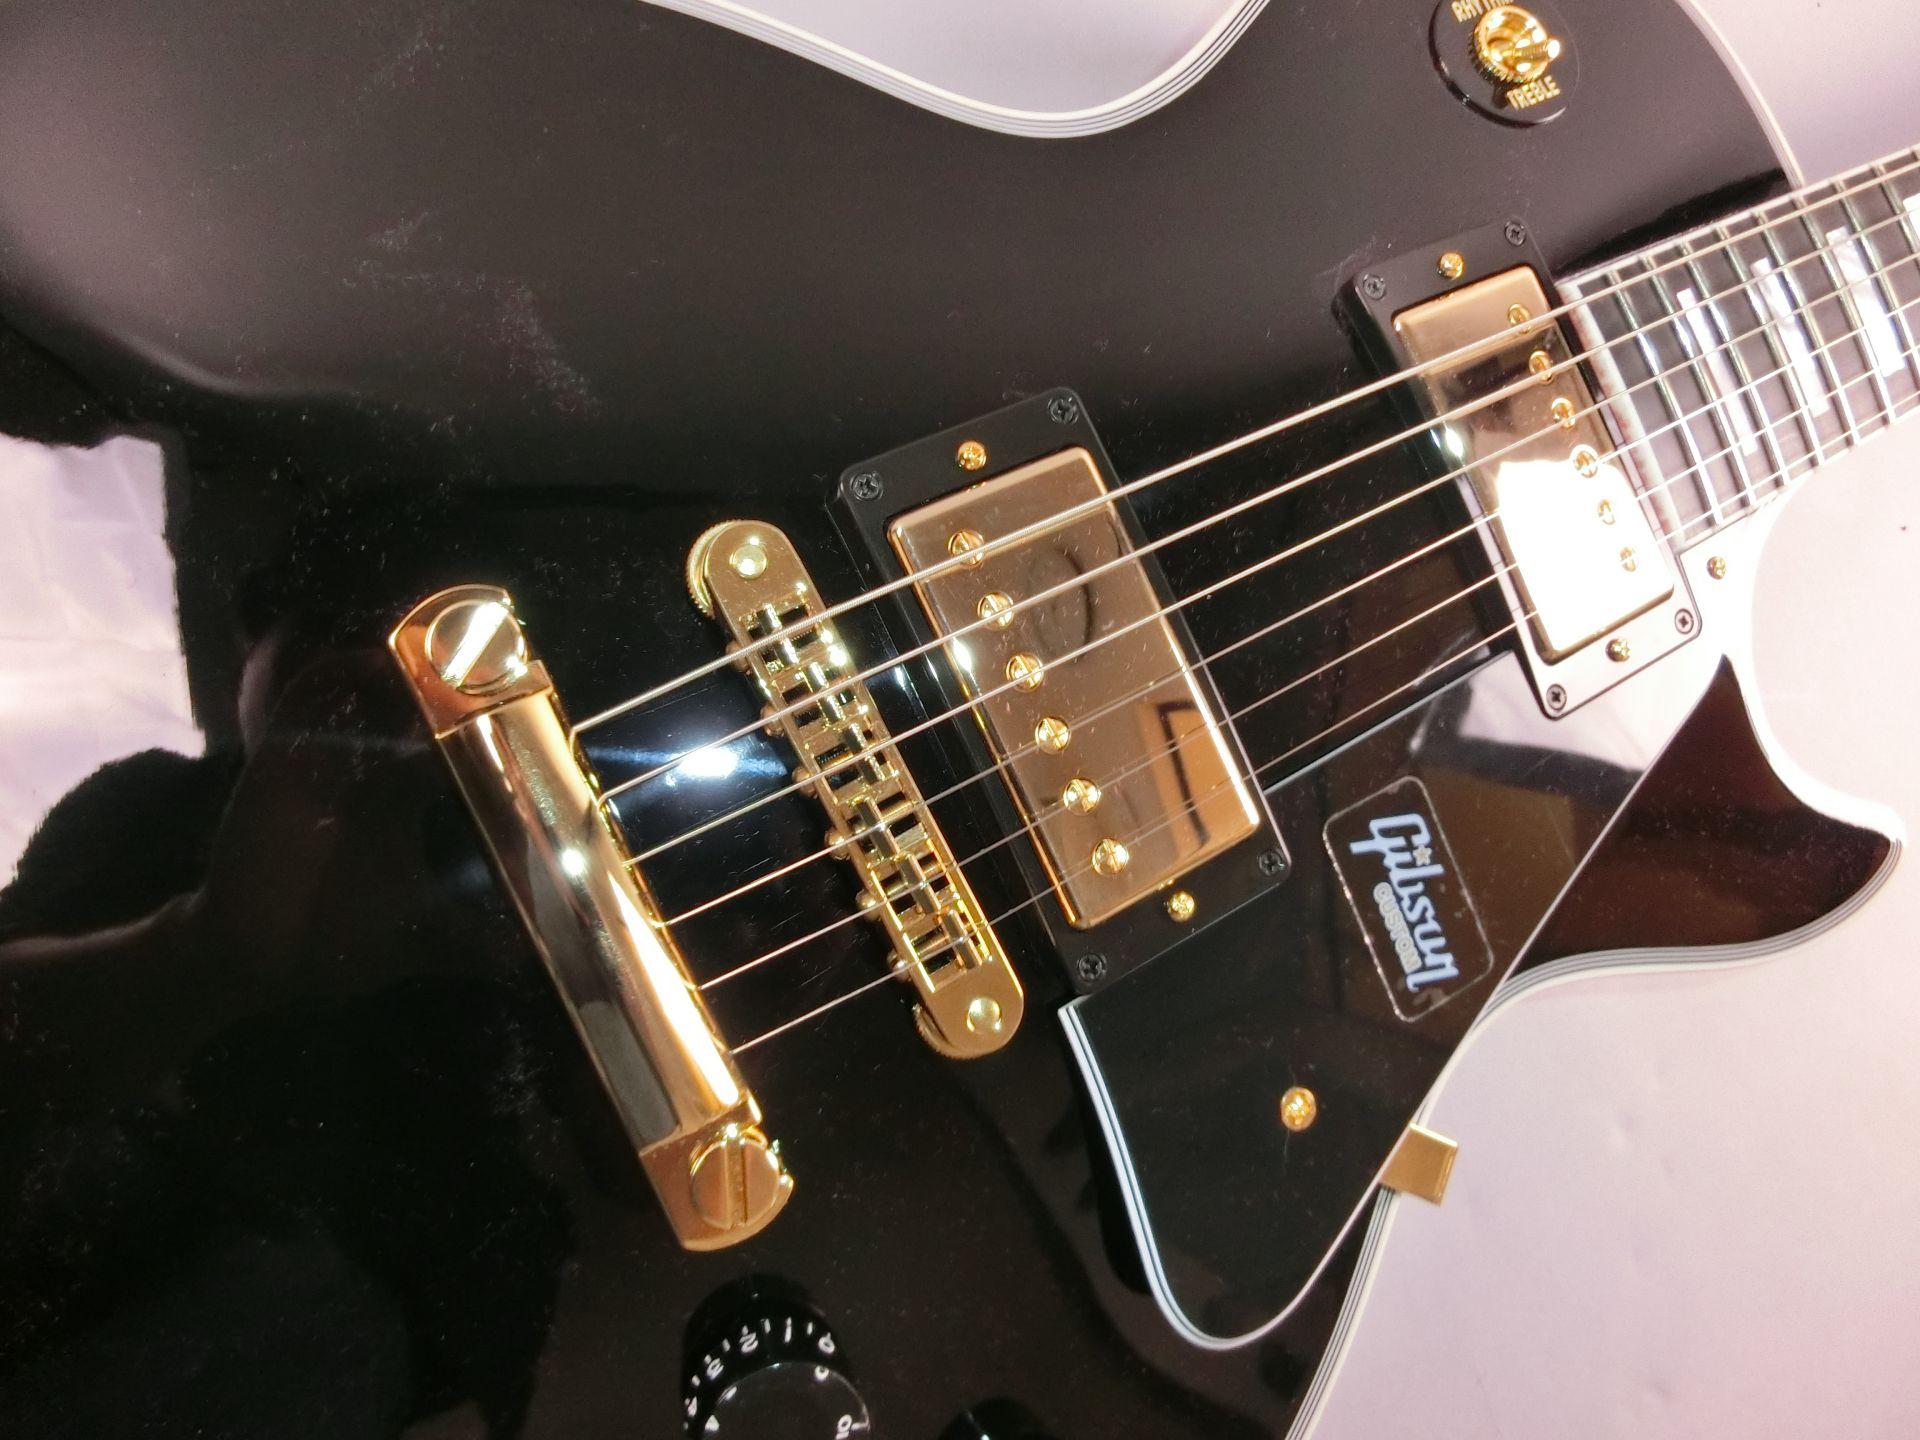 Les Paul Custom Ebony GHのボディトップ-アップ画像